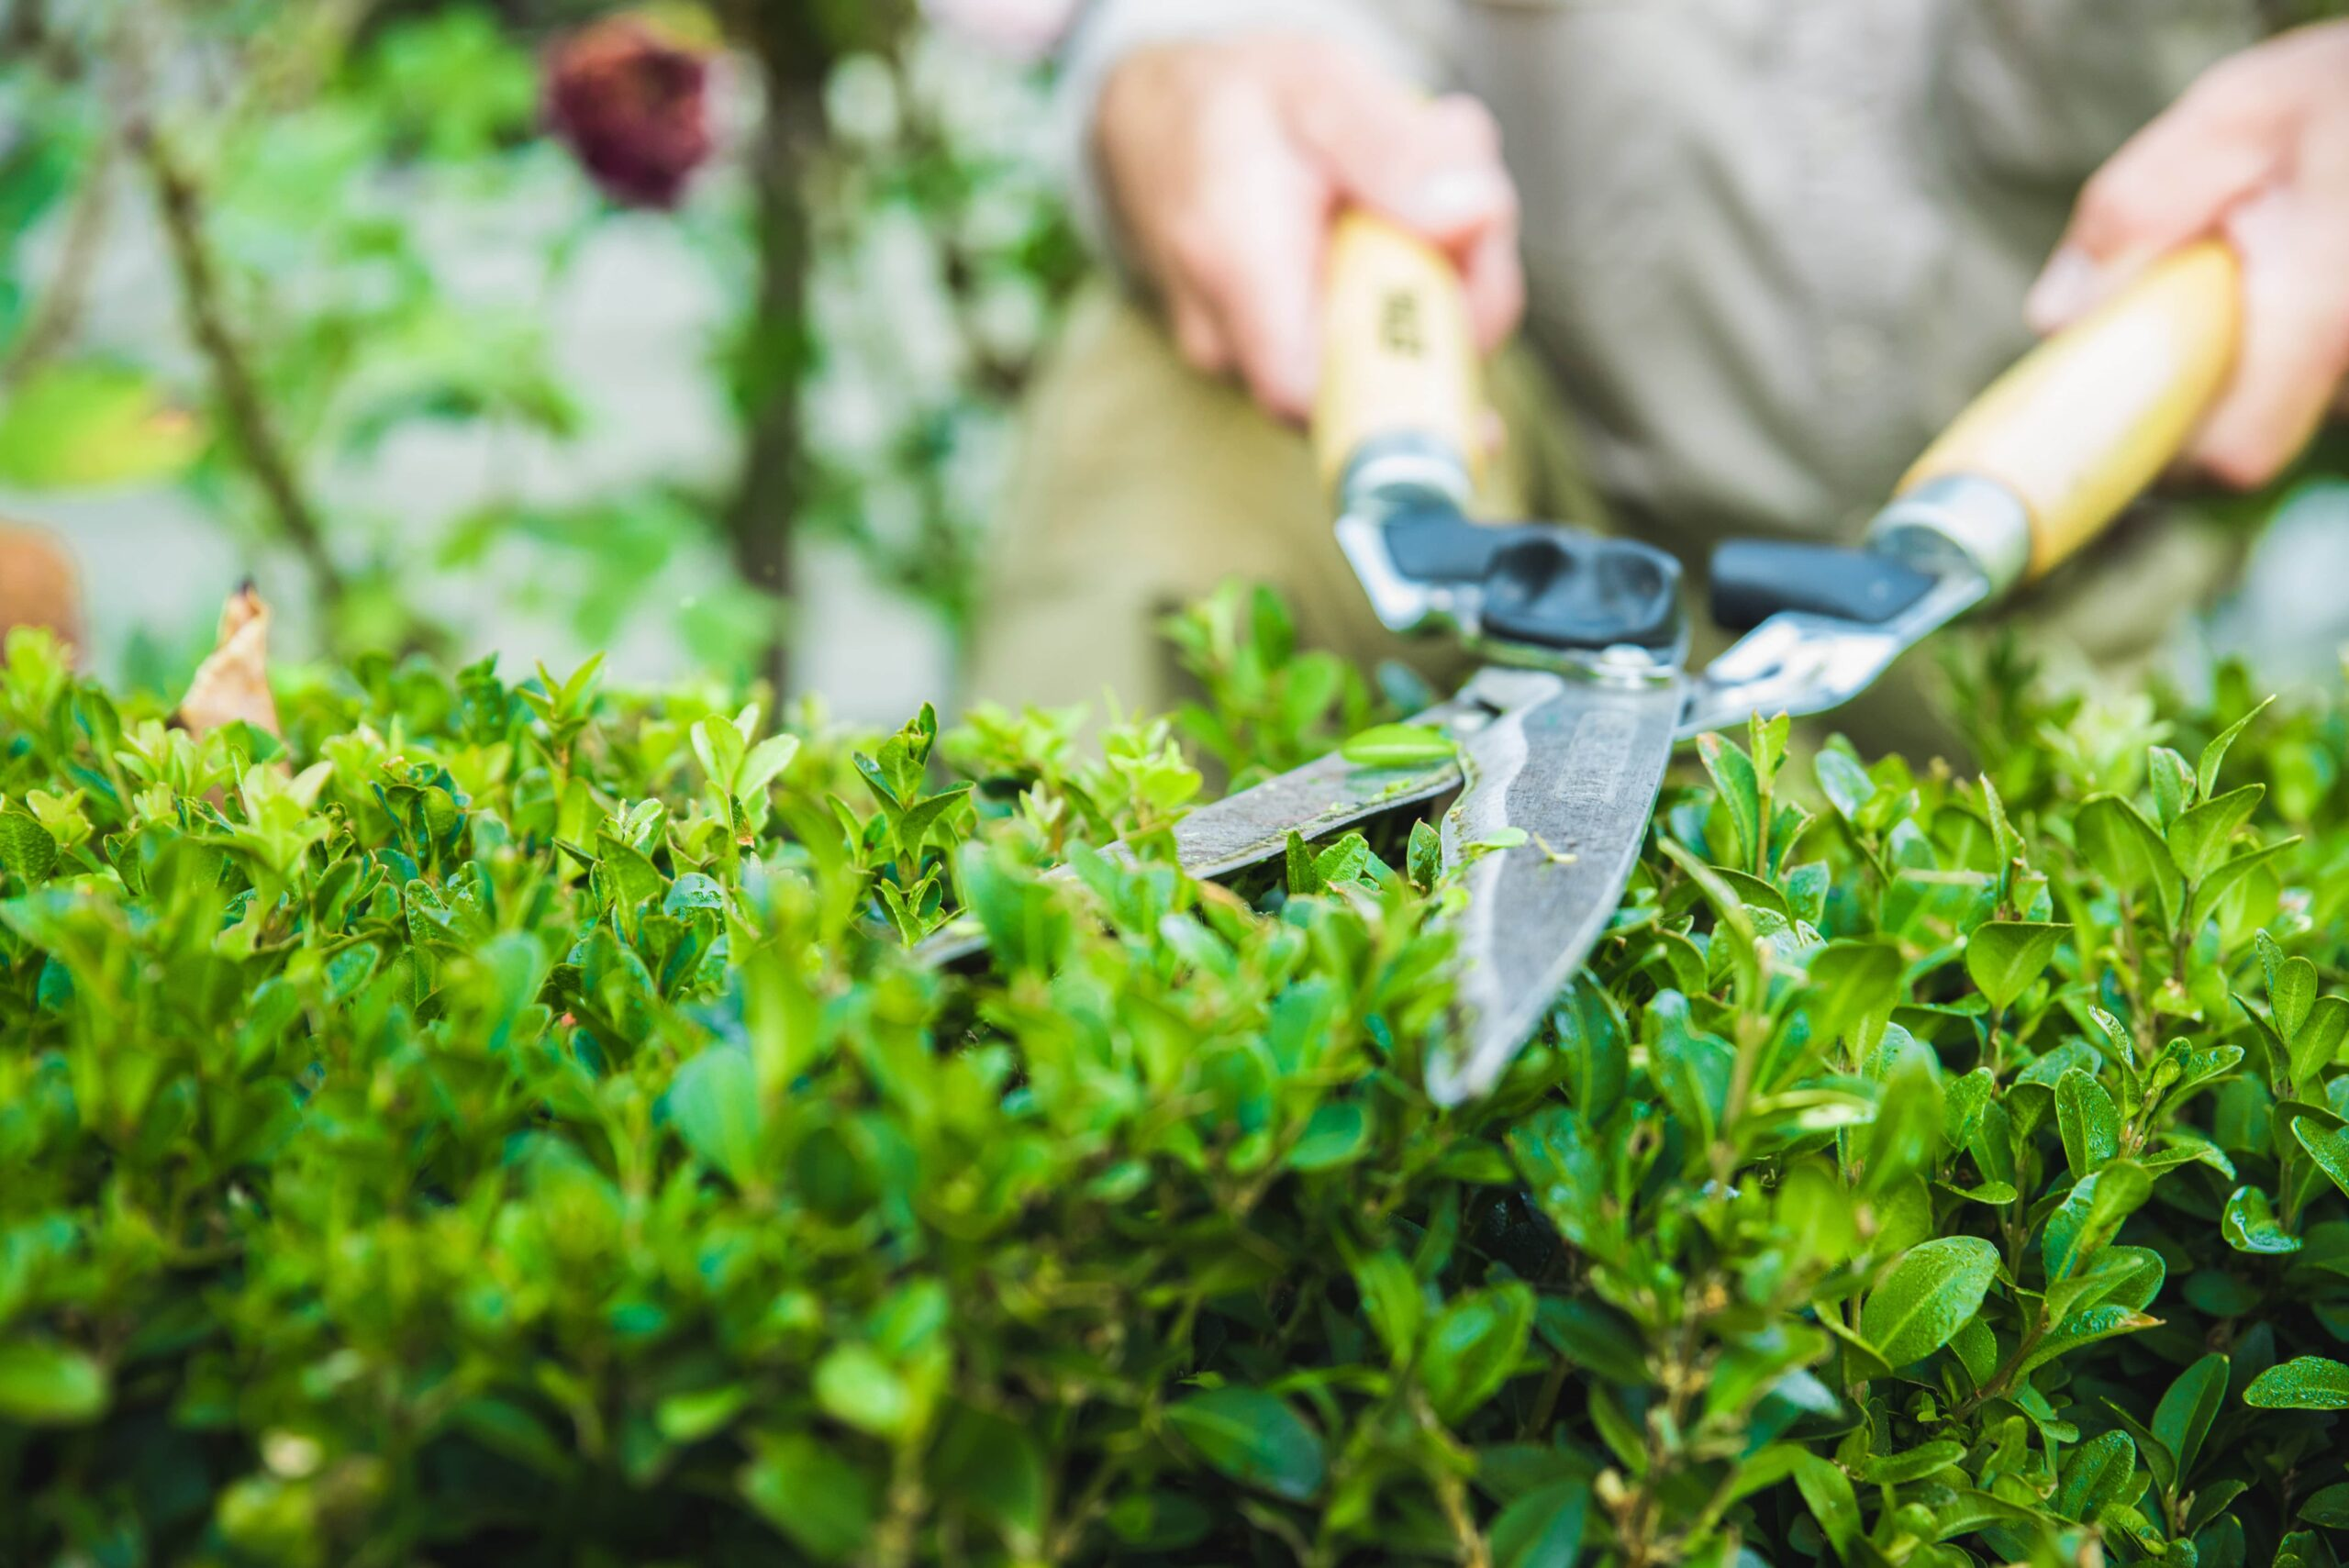 garden-shears-trimming-hedge-ADY8VCM-min